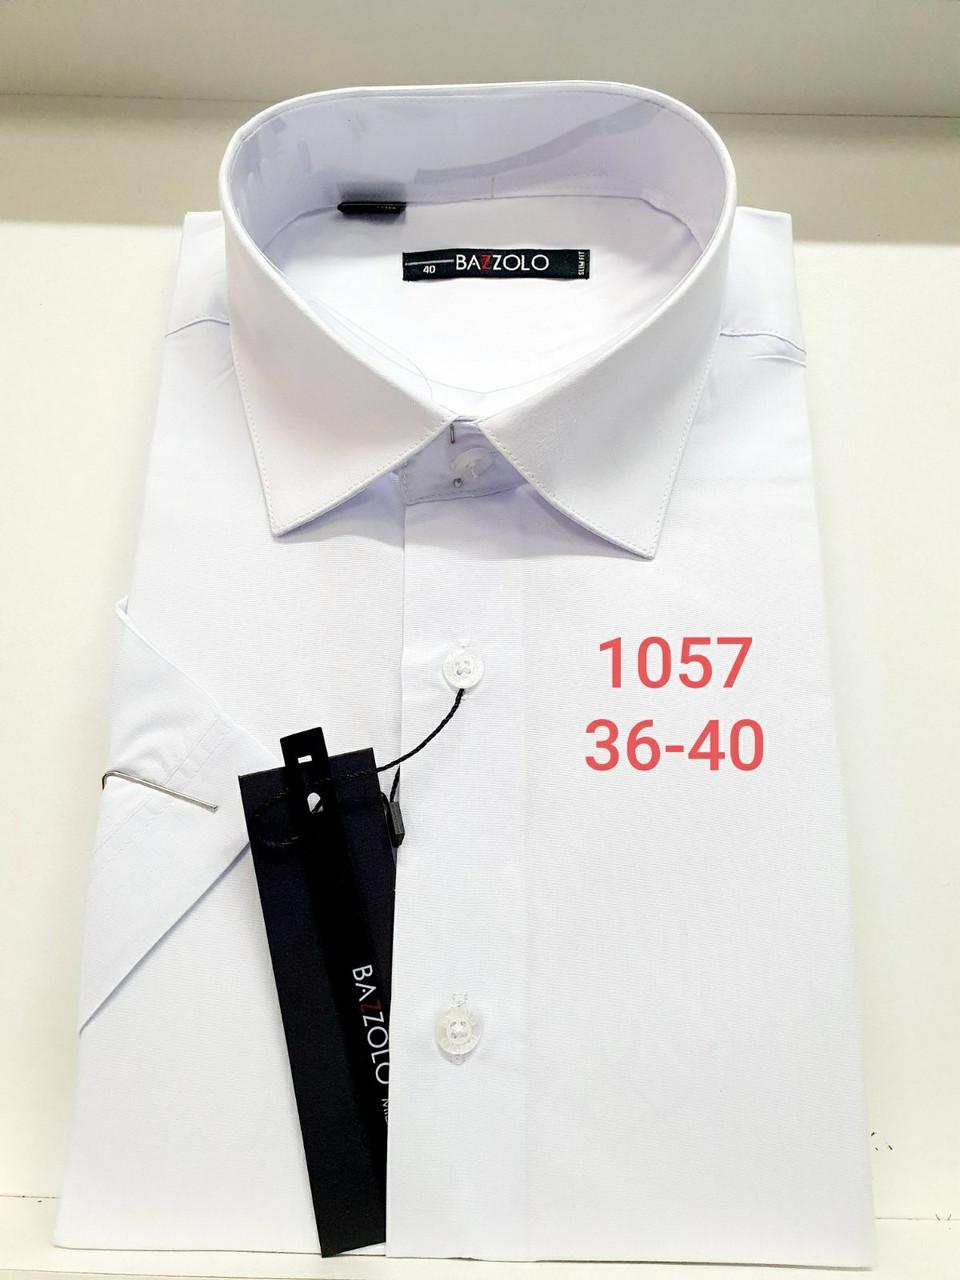 Однотонная белая рубашка с коротким рукавом Bazzolo 1057